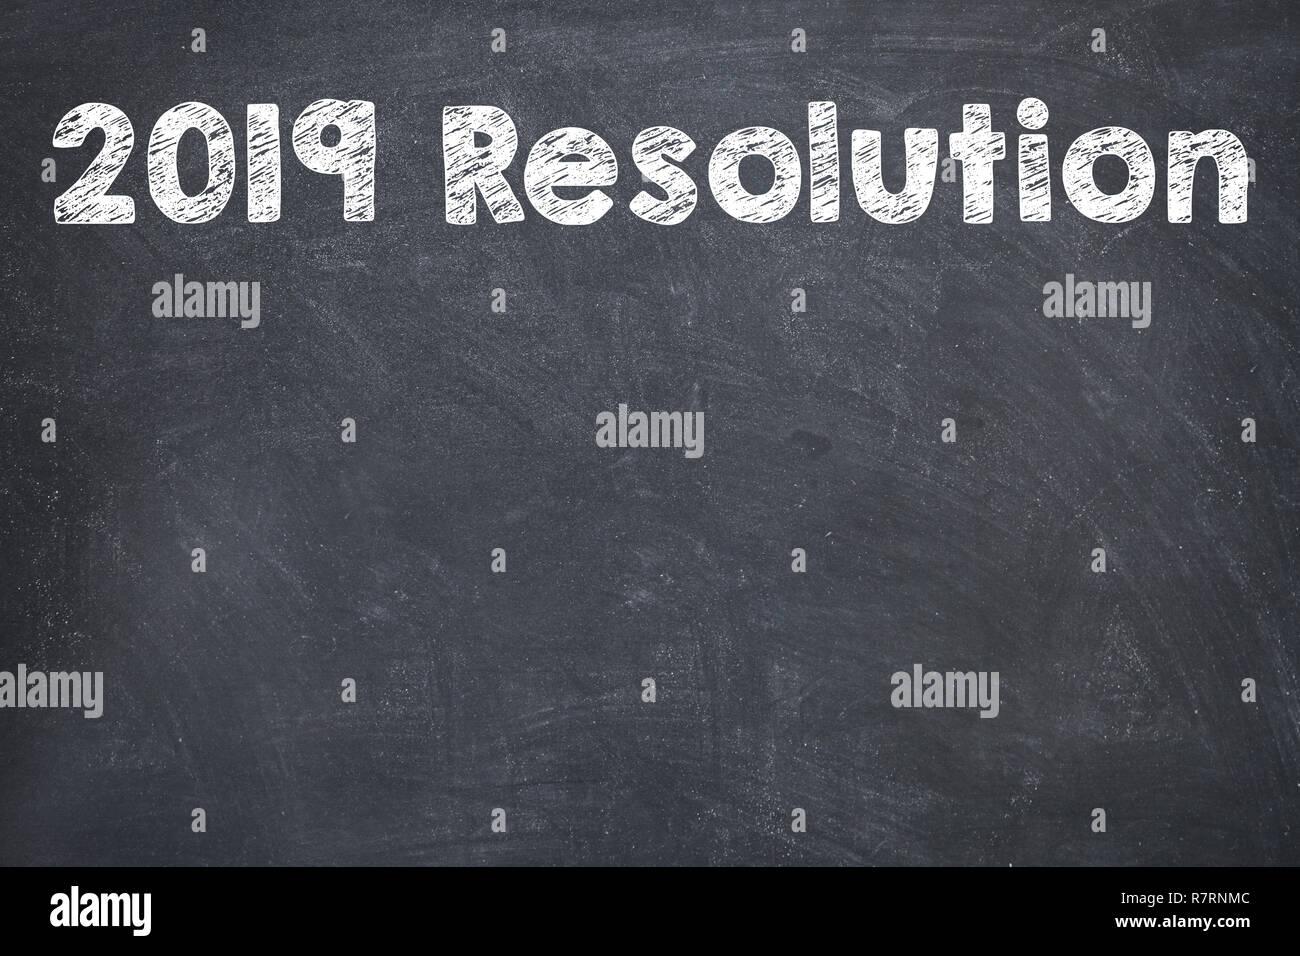 2019 New Year Resolution Check List on Blackboard - Stock Image